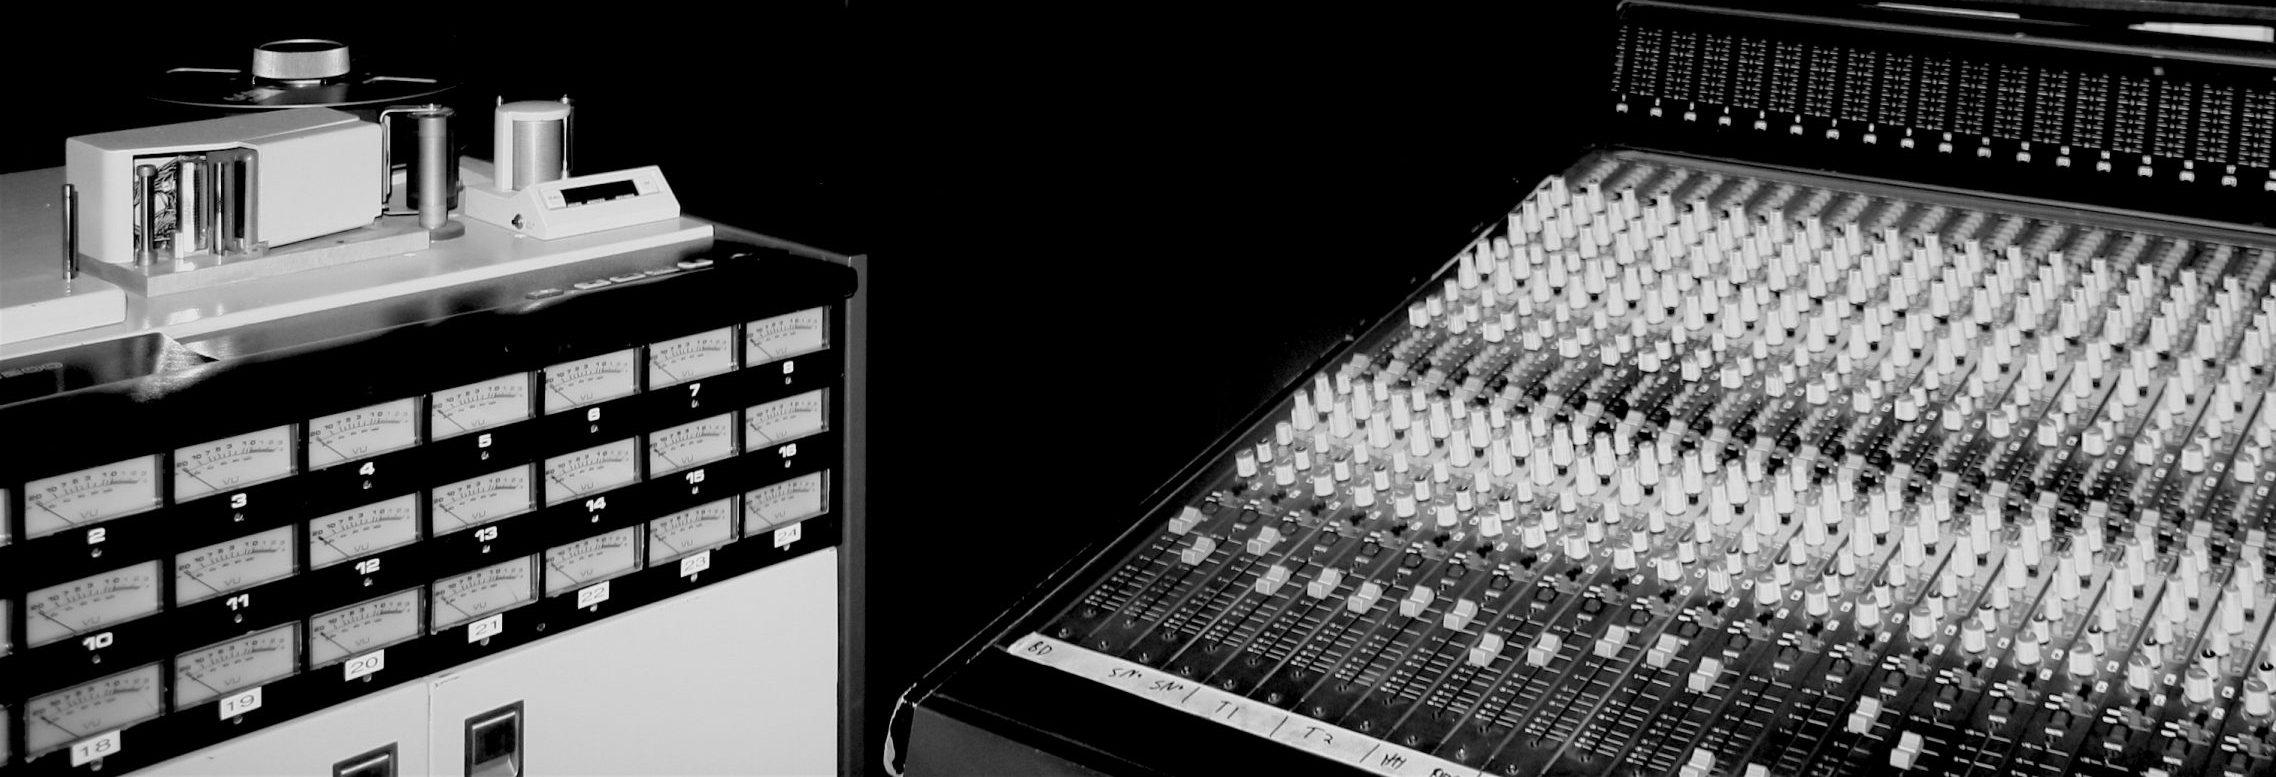 UNDERGROUND AUDIO - Recording Studio